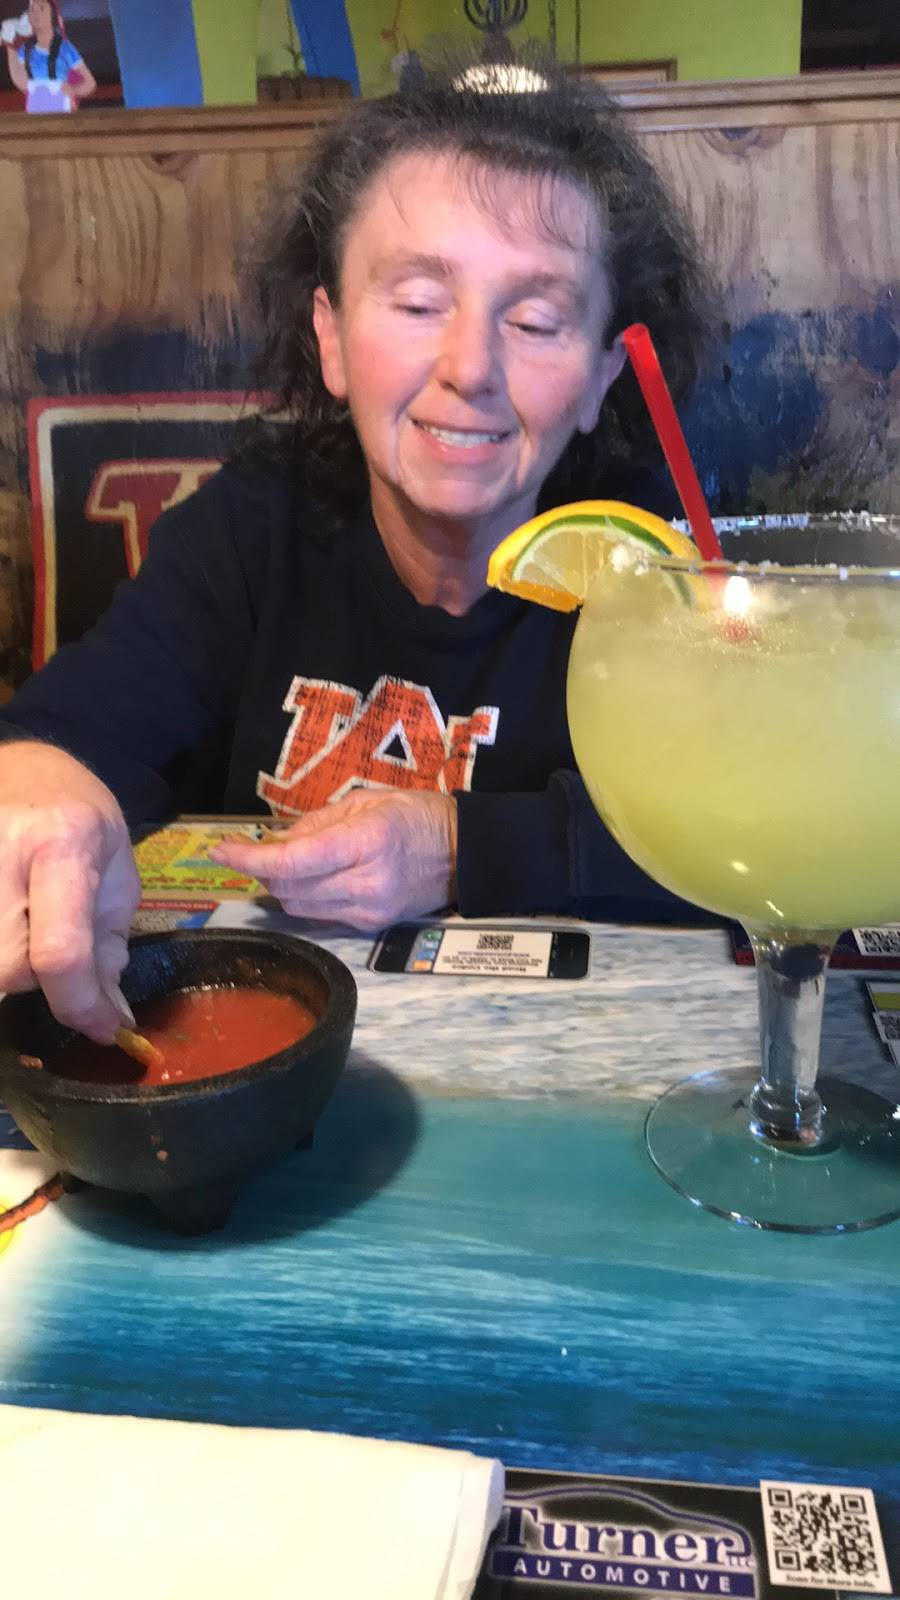 Acapulcos Mexican Grill | restaurant | 1409 S College St, Auburn, AL 36832, USA | 3345019197 OR +1 334-501-9197